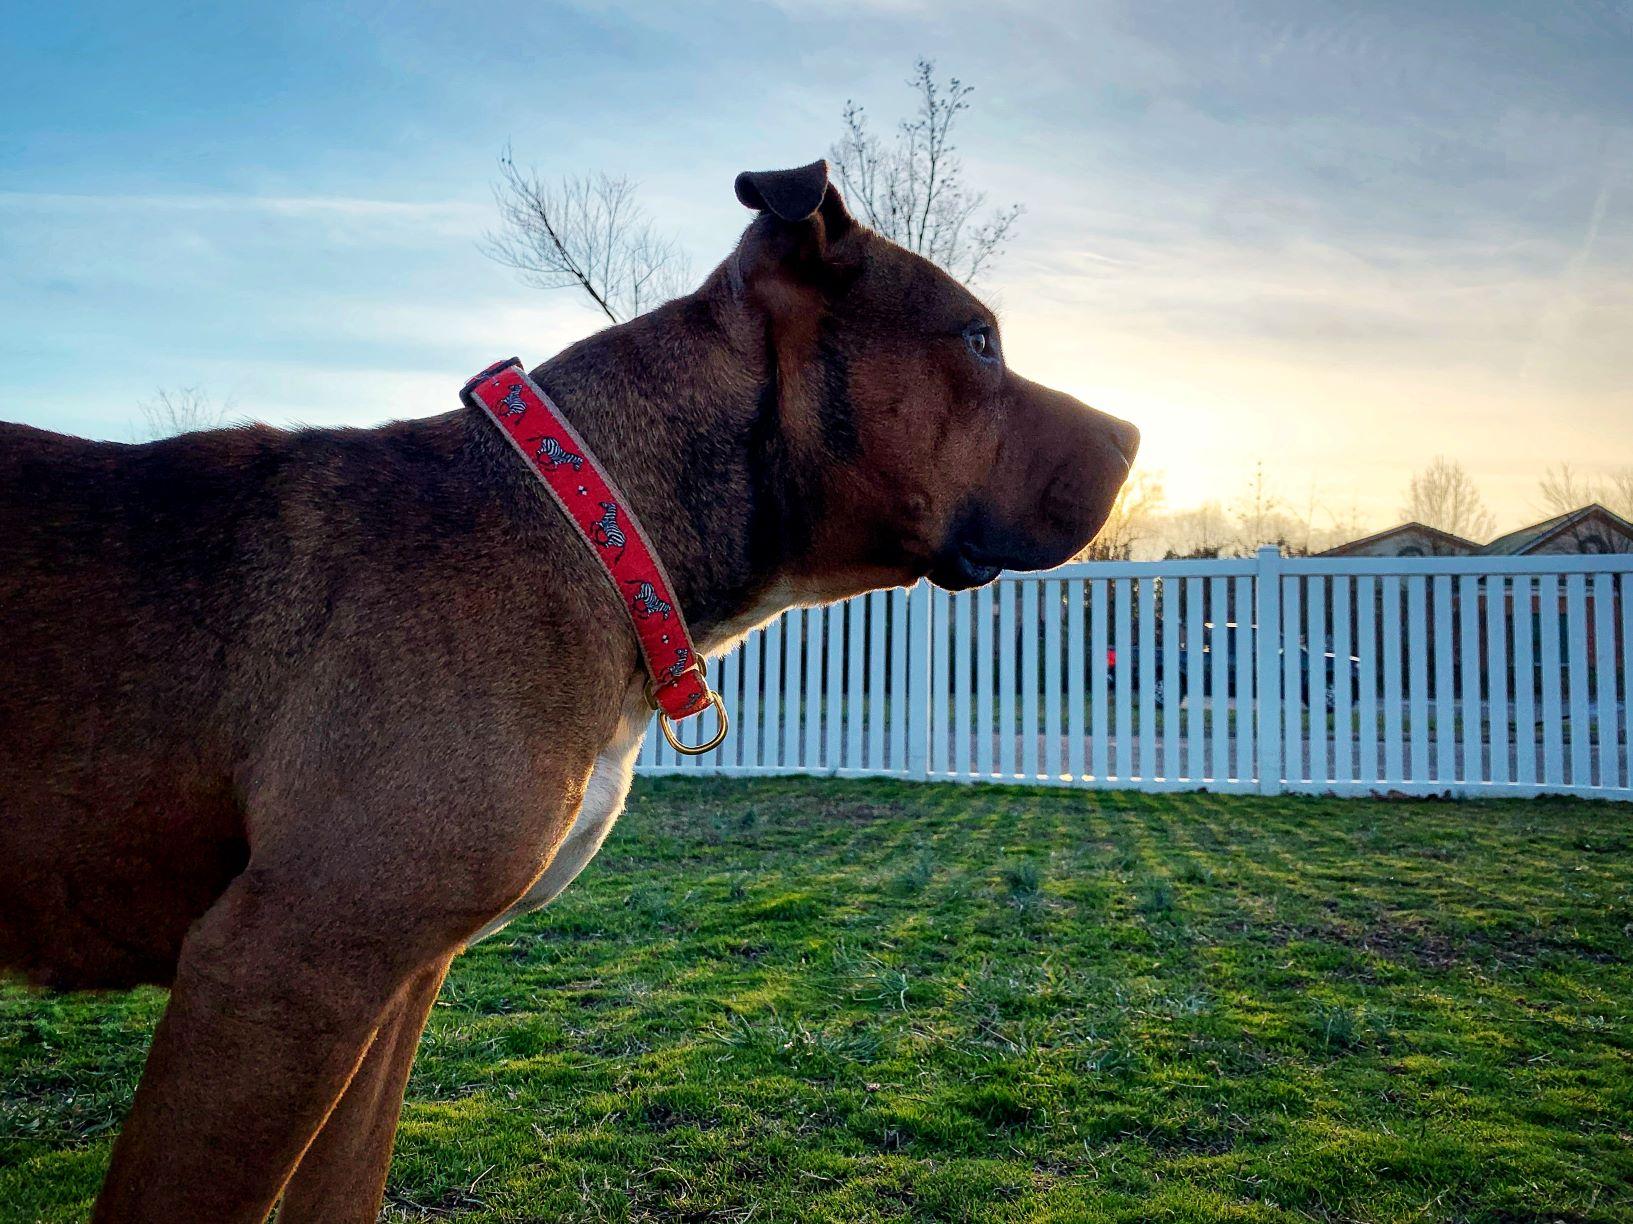 Darcy looking ahead